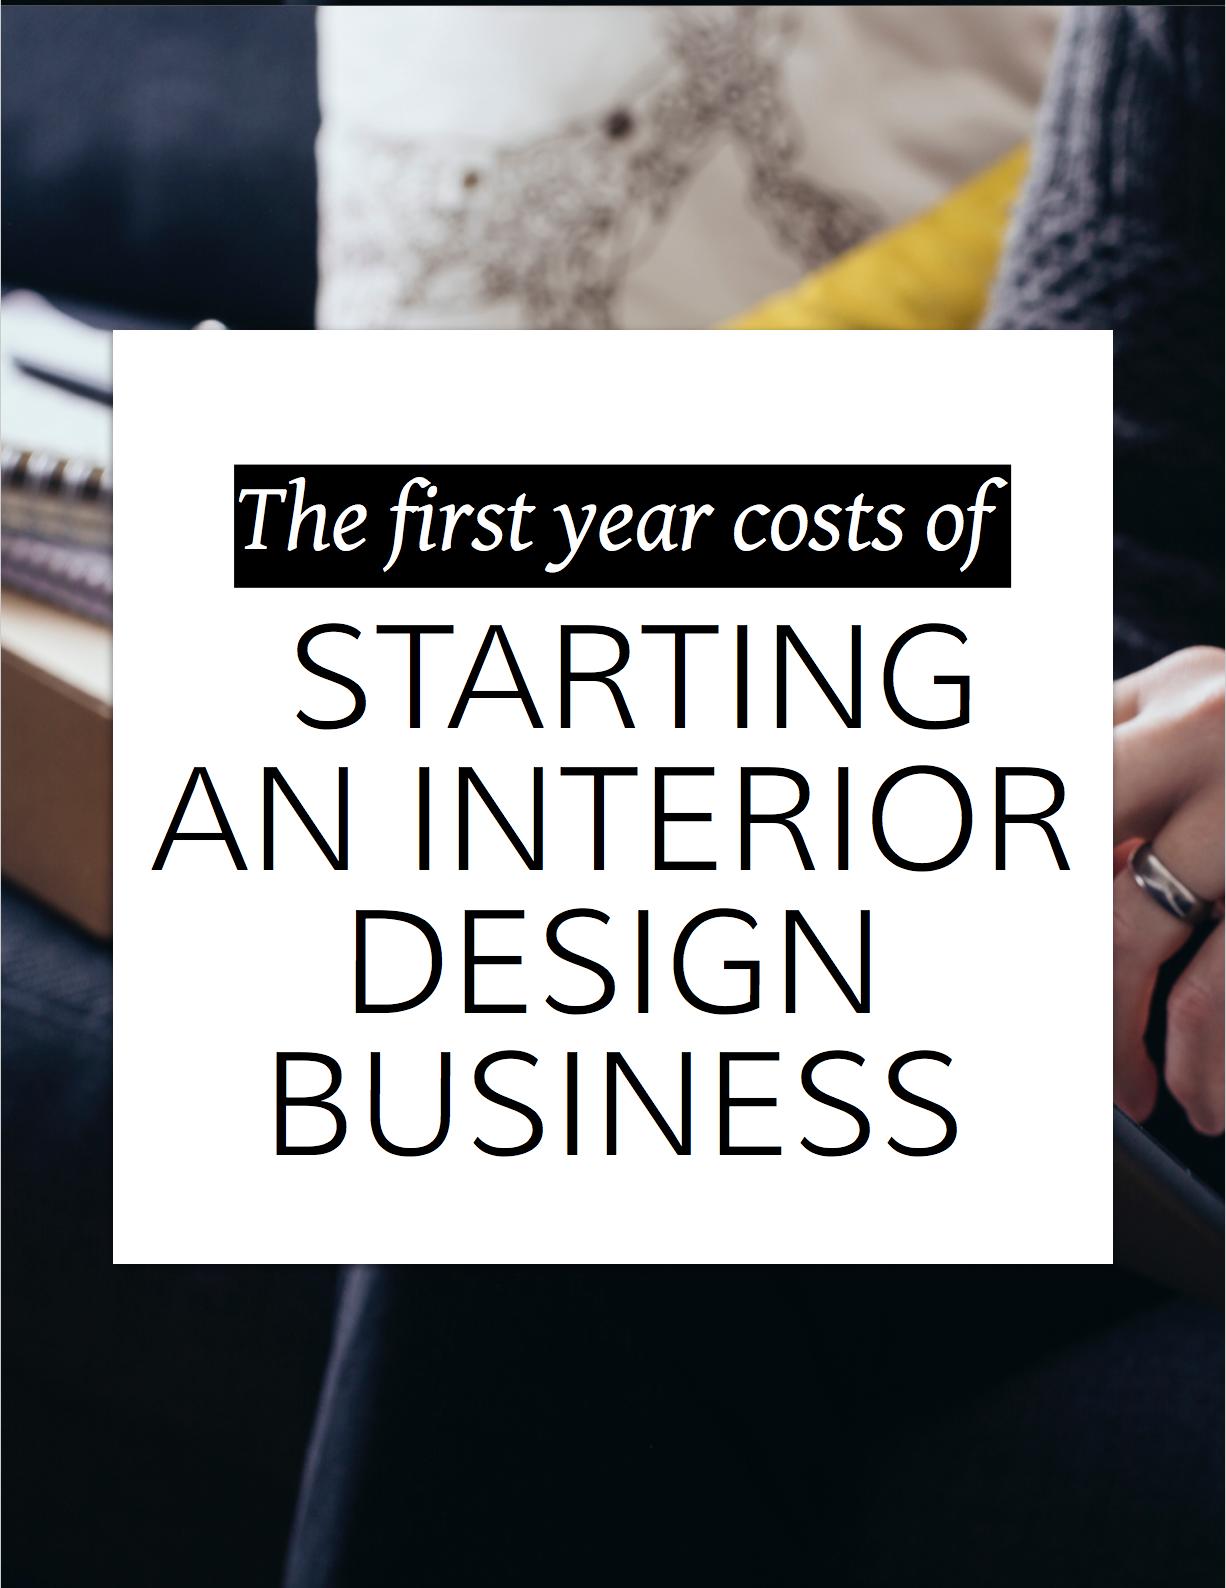 Interior Design Business Start-up Costs | Interior design business ...